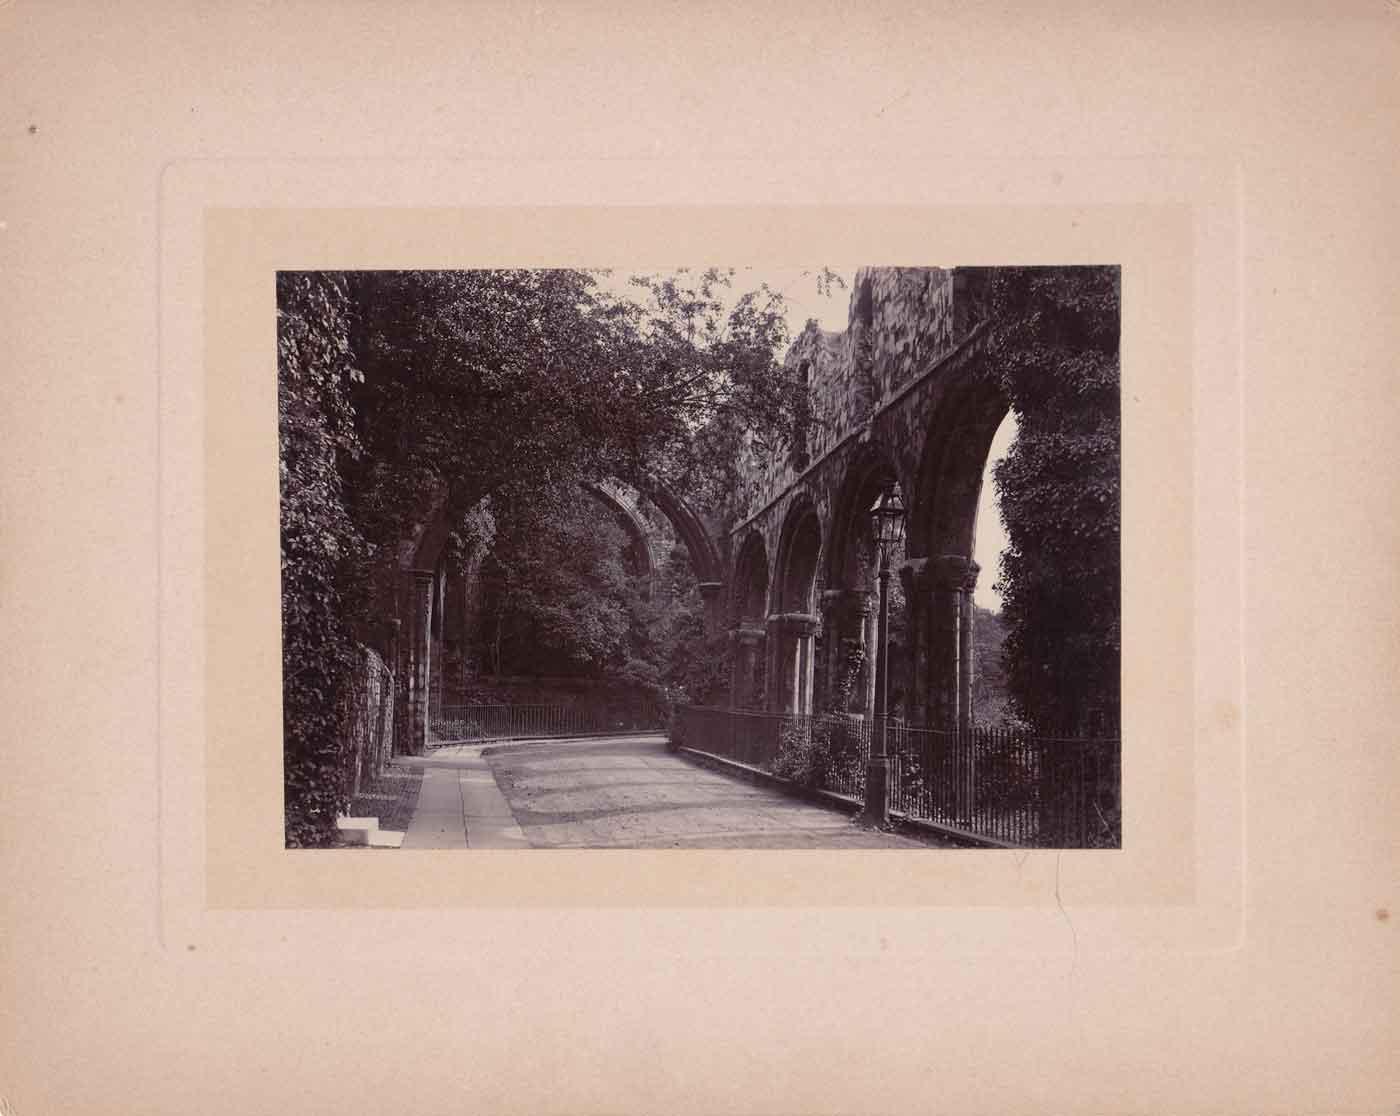 SAPS-Feb-1893-Close-in-CanterburyWEB.jpg